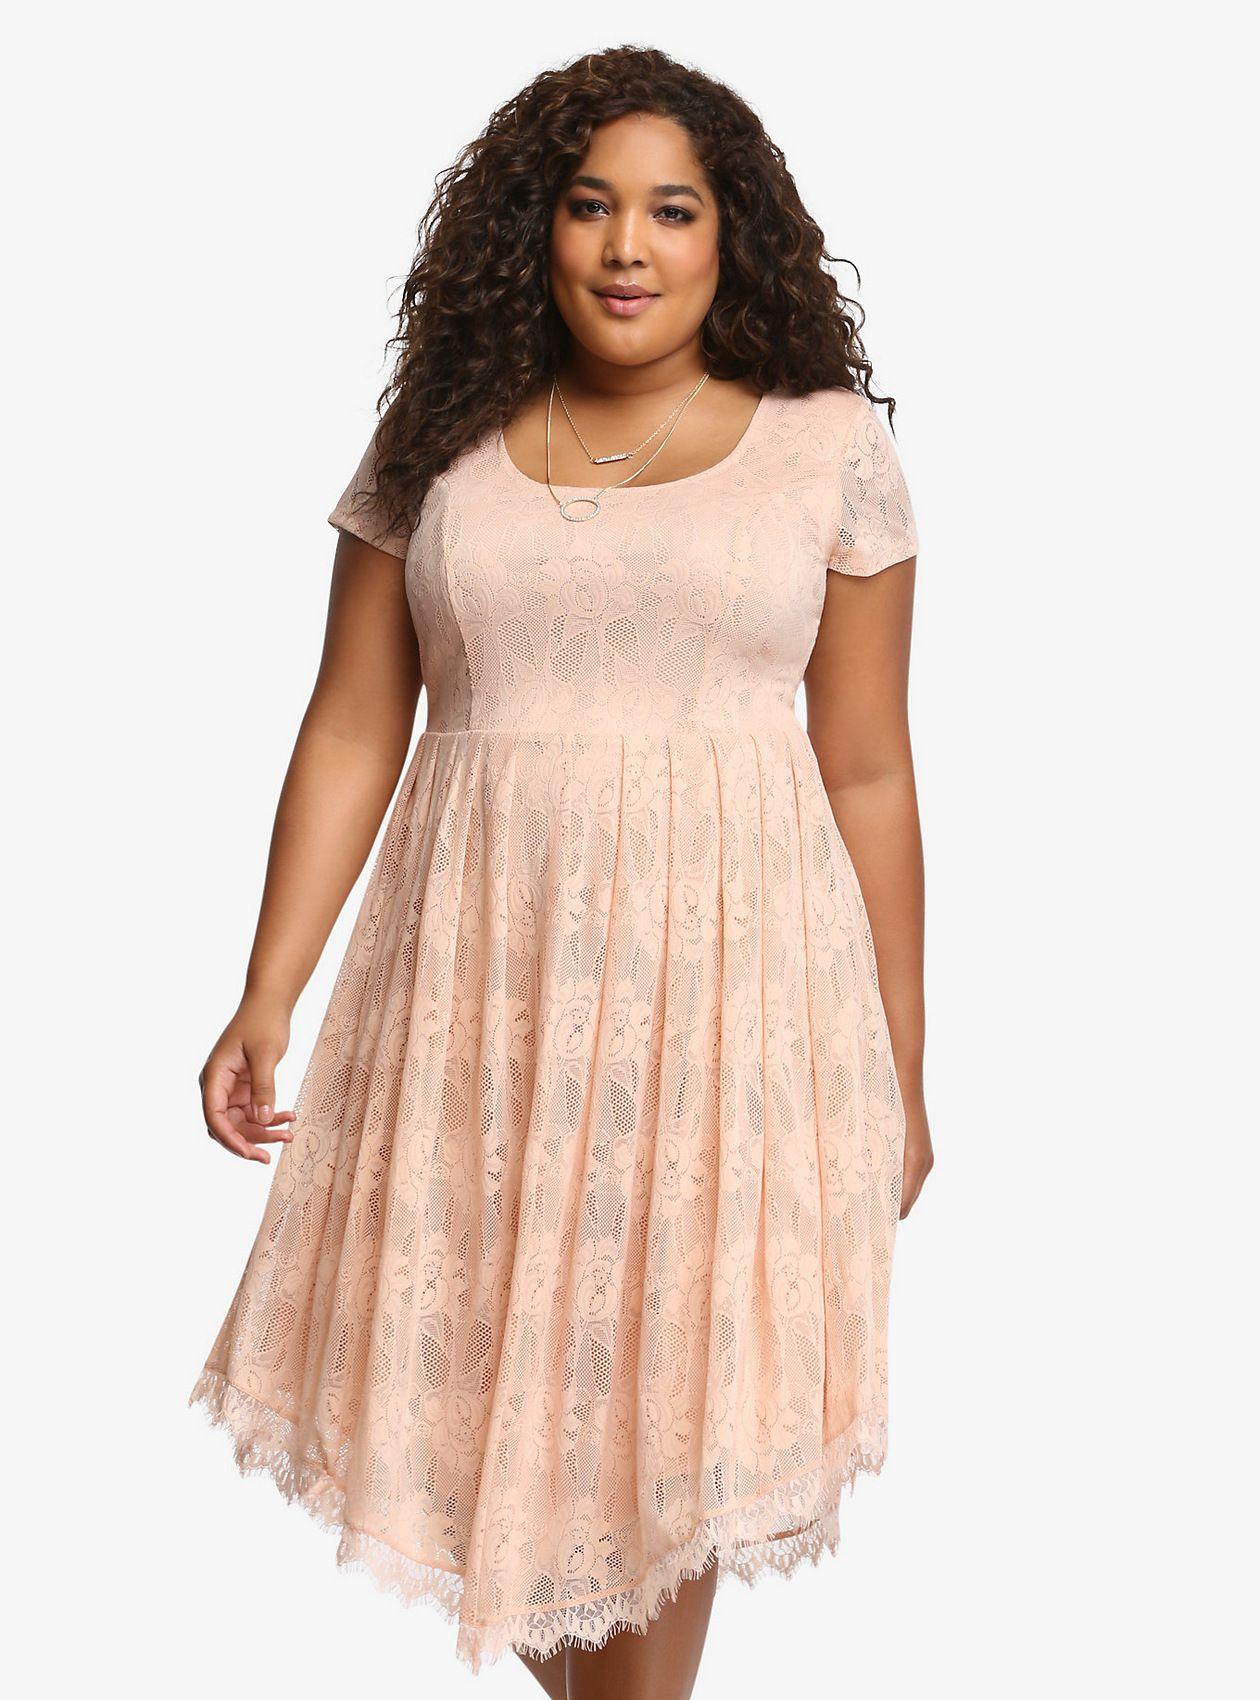 297f3829c5 Wedding Guest Dresses Plus Size Torrid - Gomes Weine AG